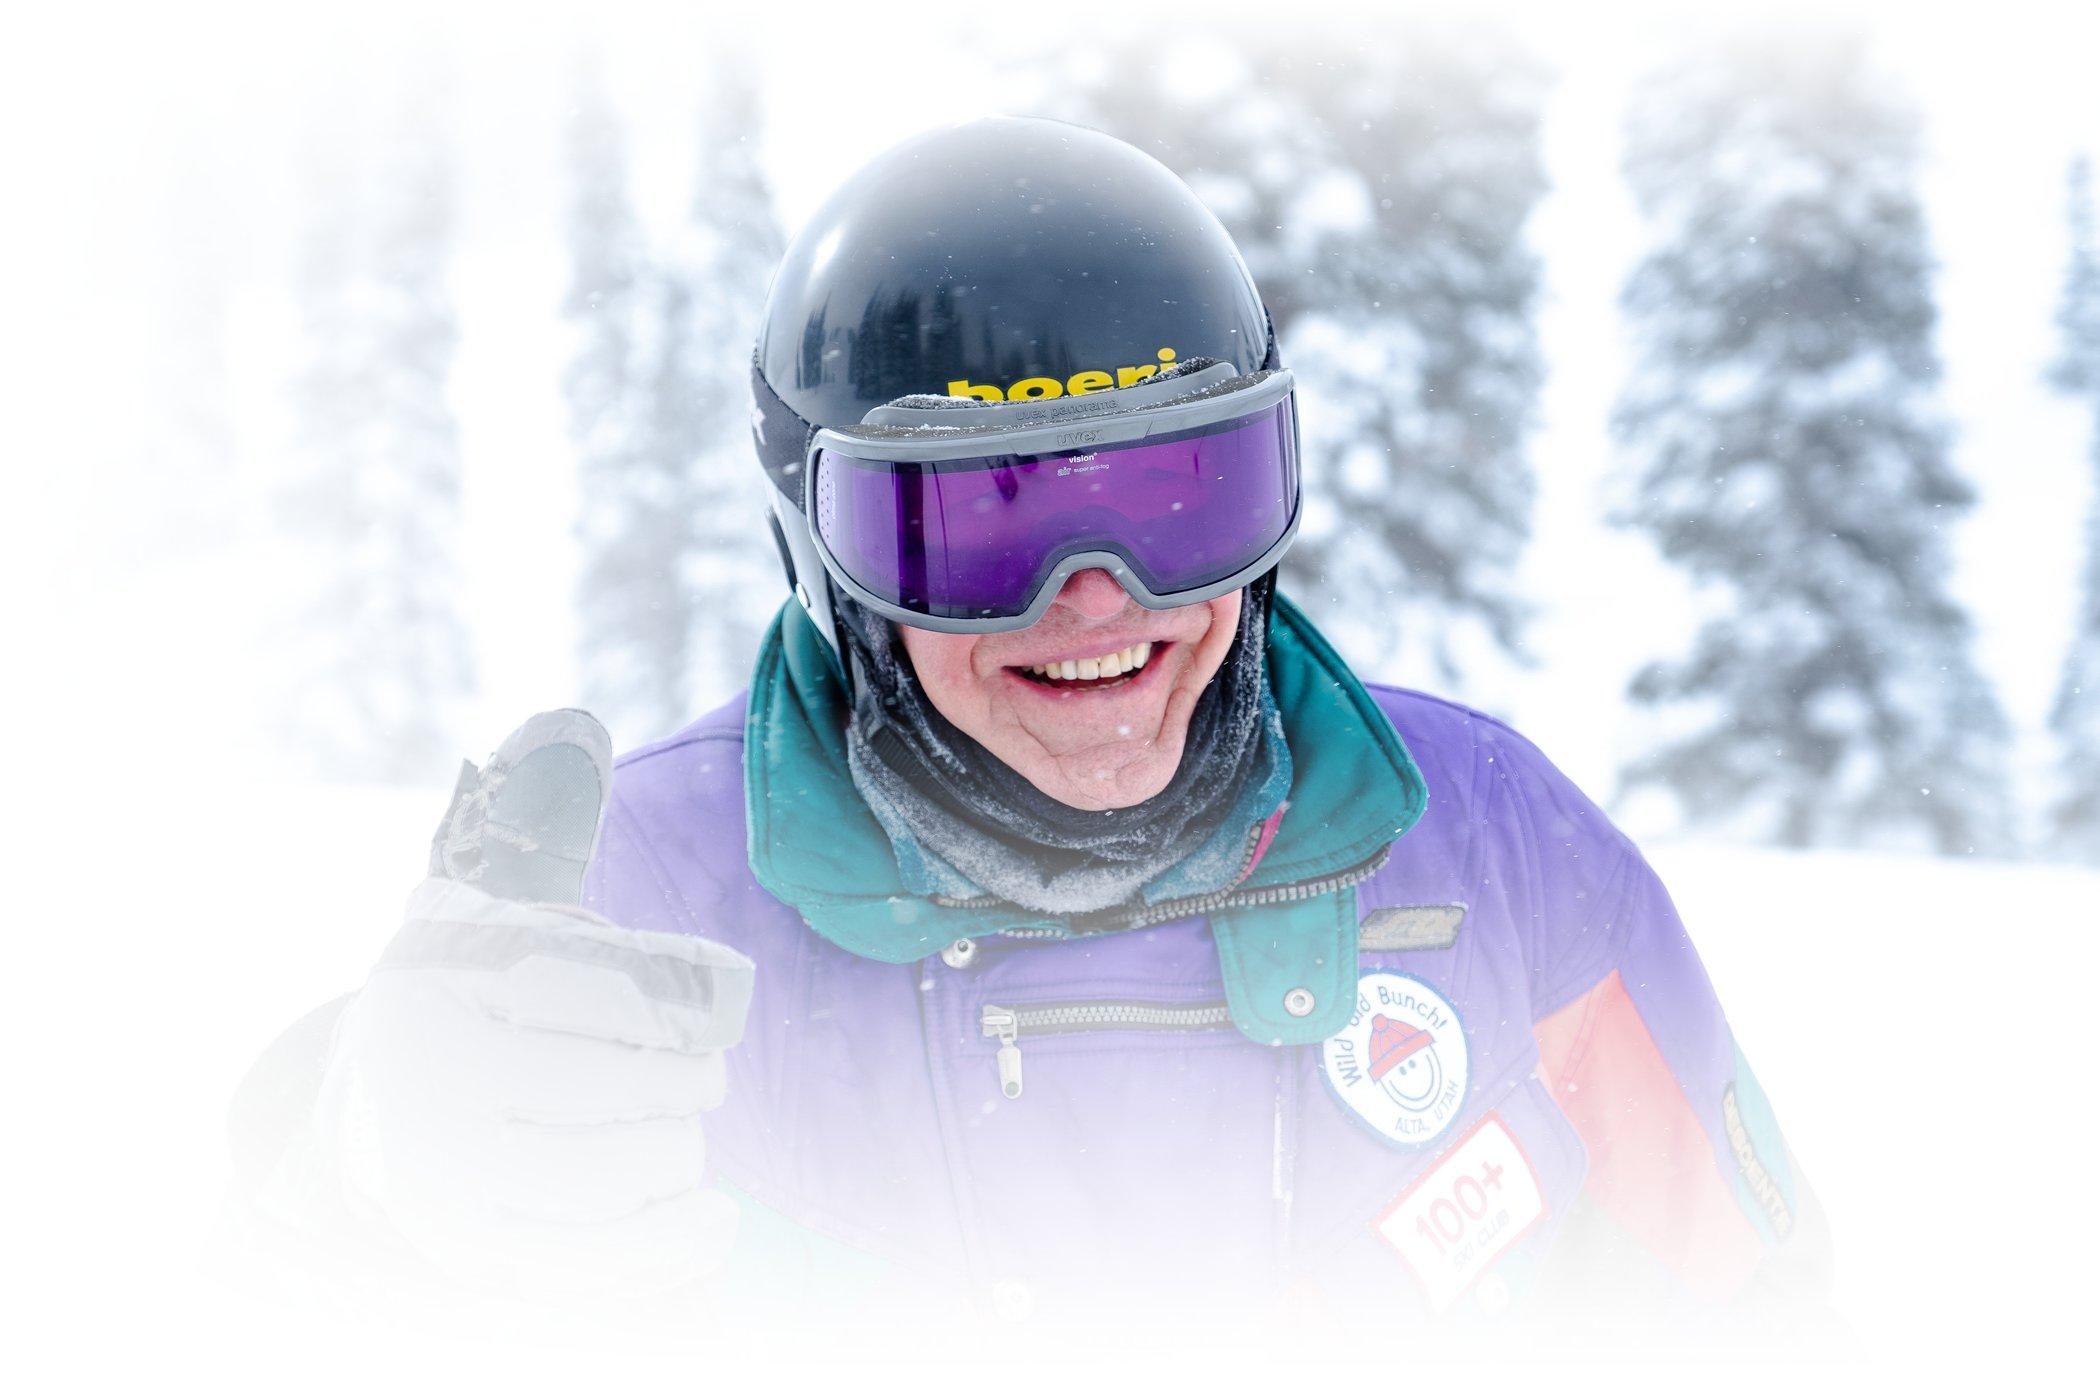 102-year-old Geroge Jedenoff skis Alta on a powder day